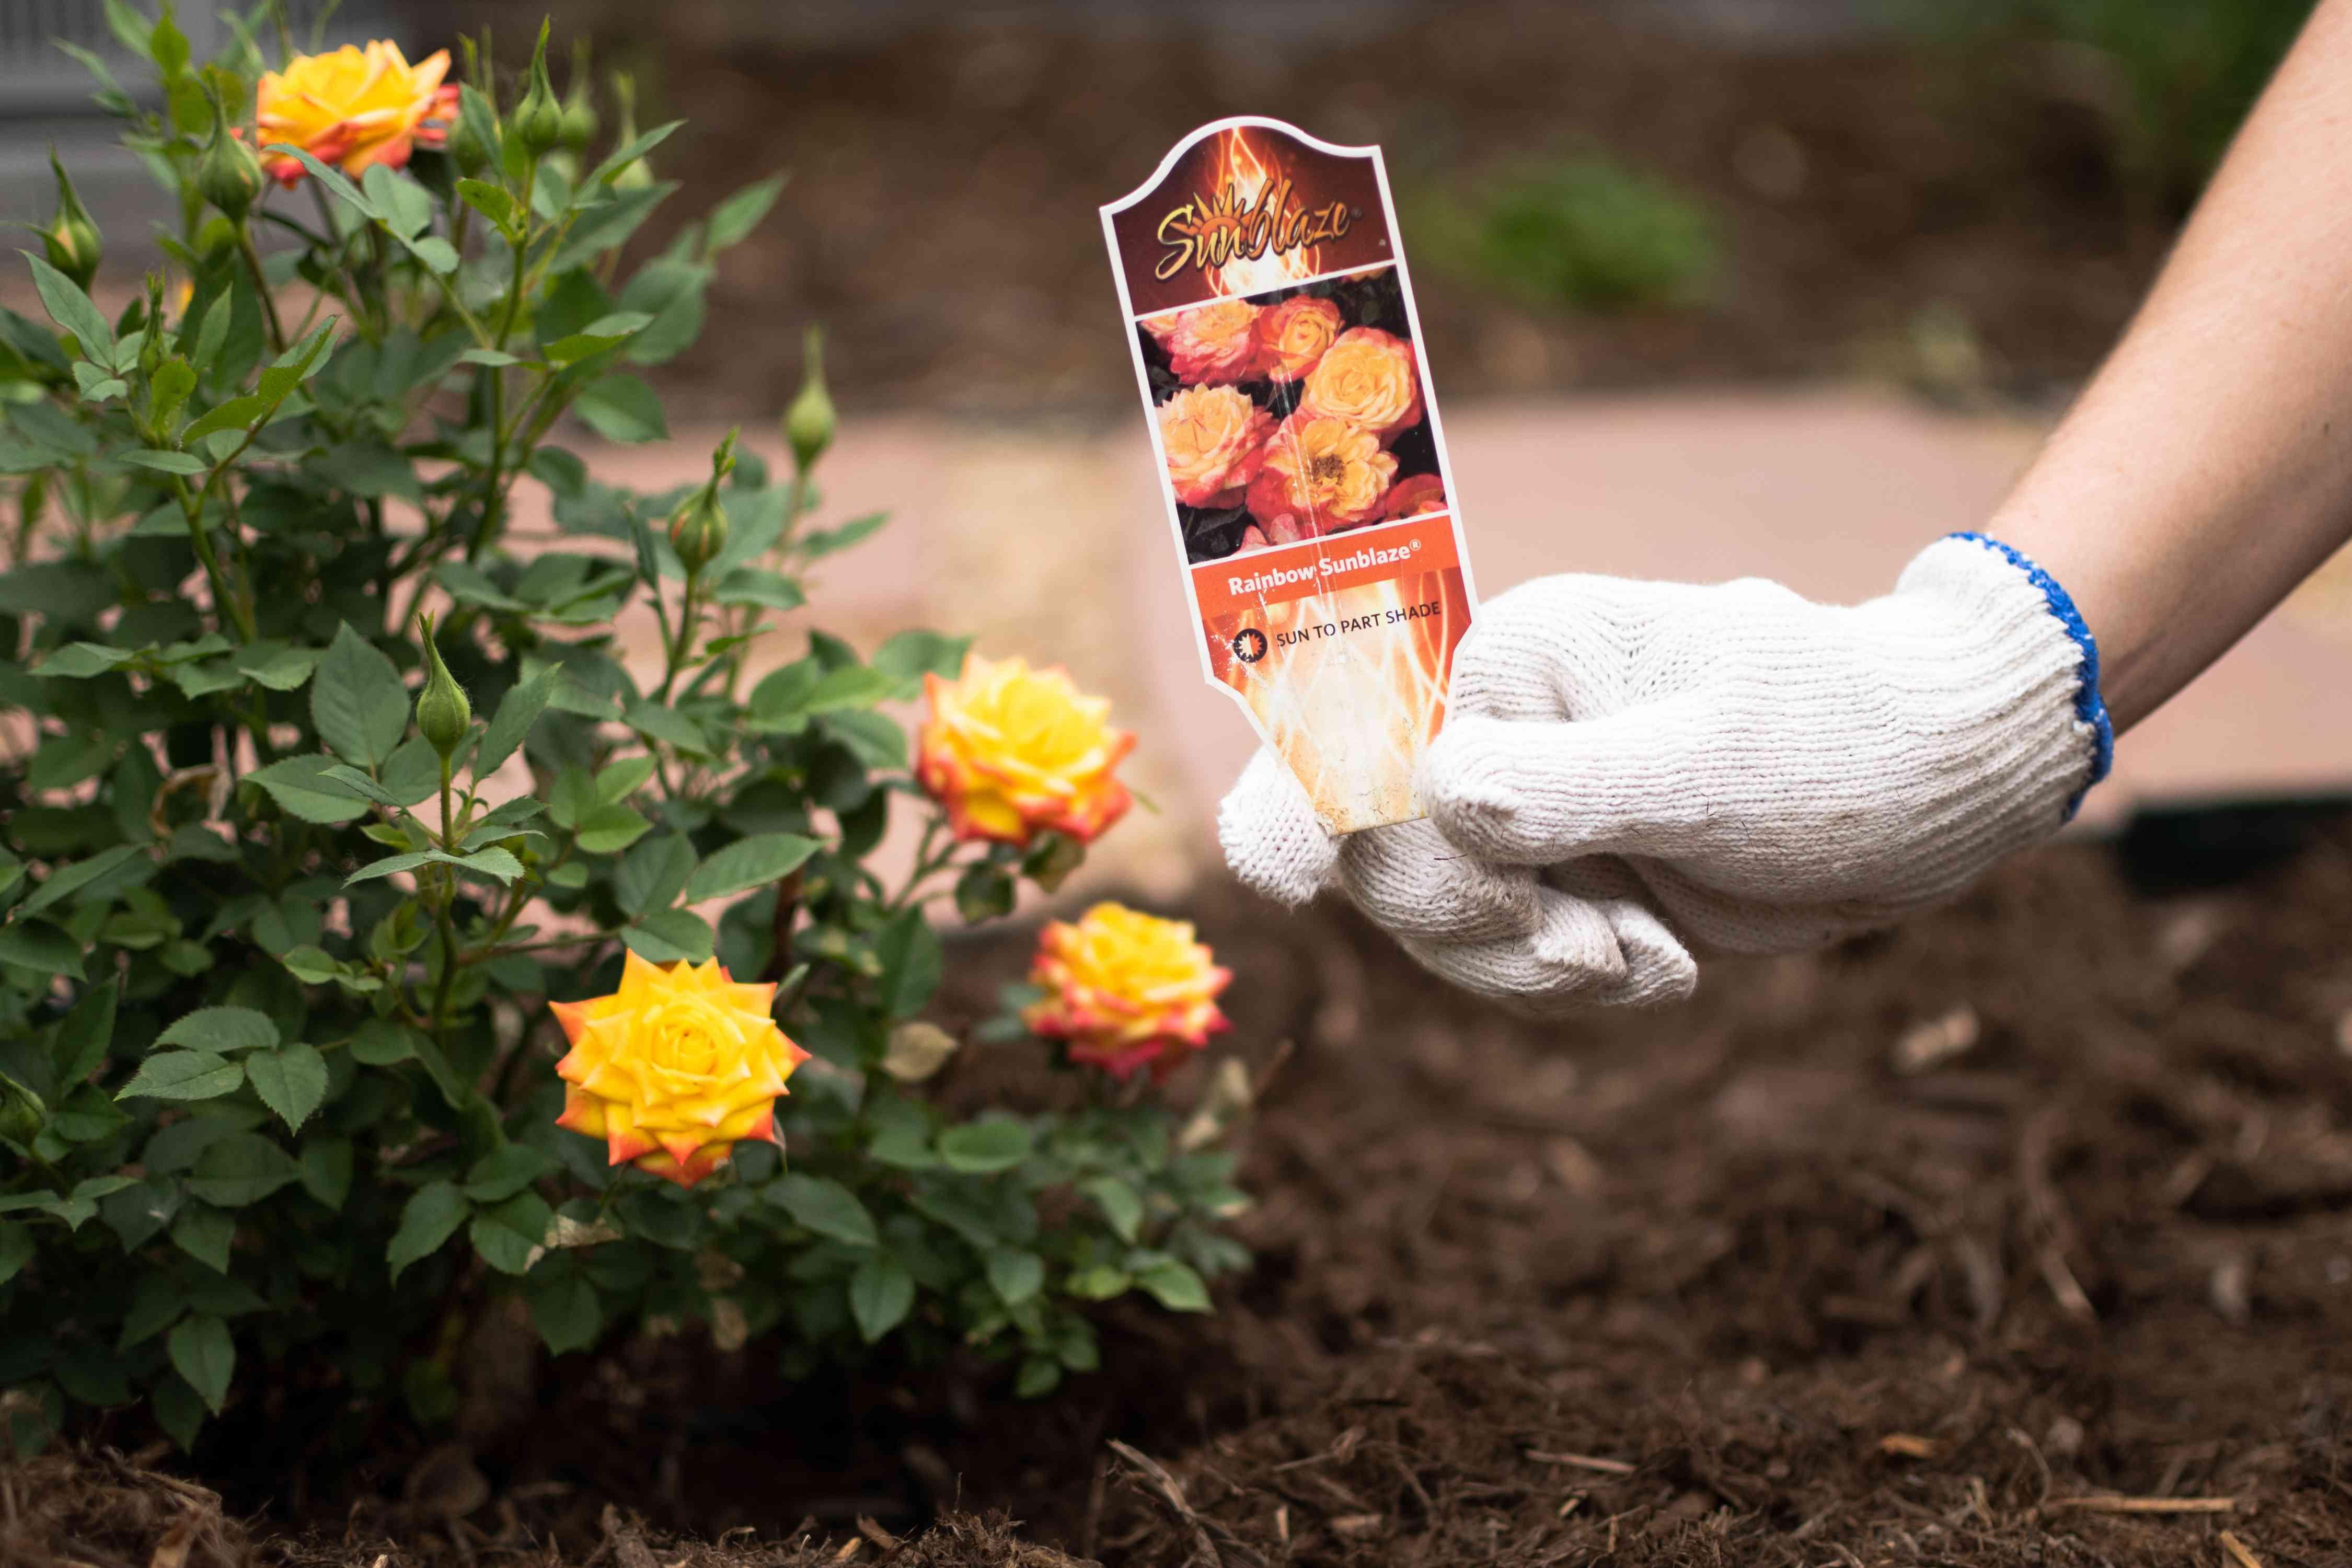 Rainbow sunblaze rose variety plant card held by rose bush